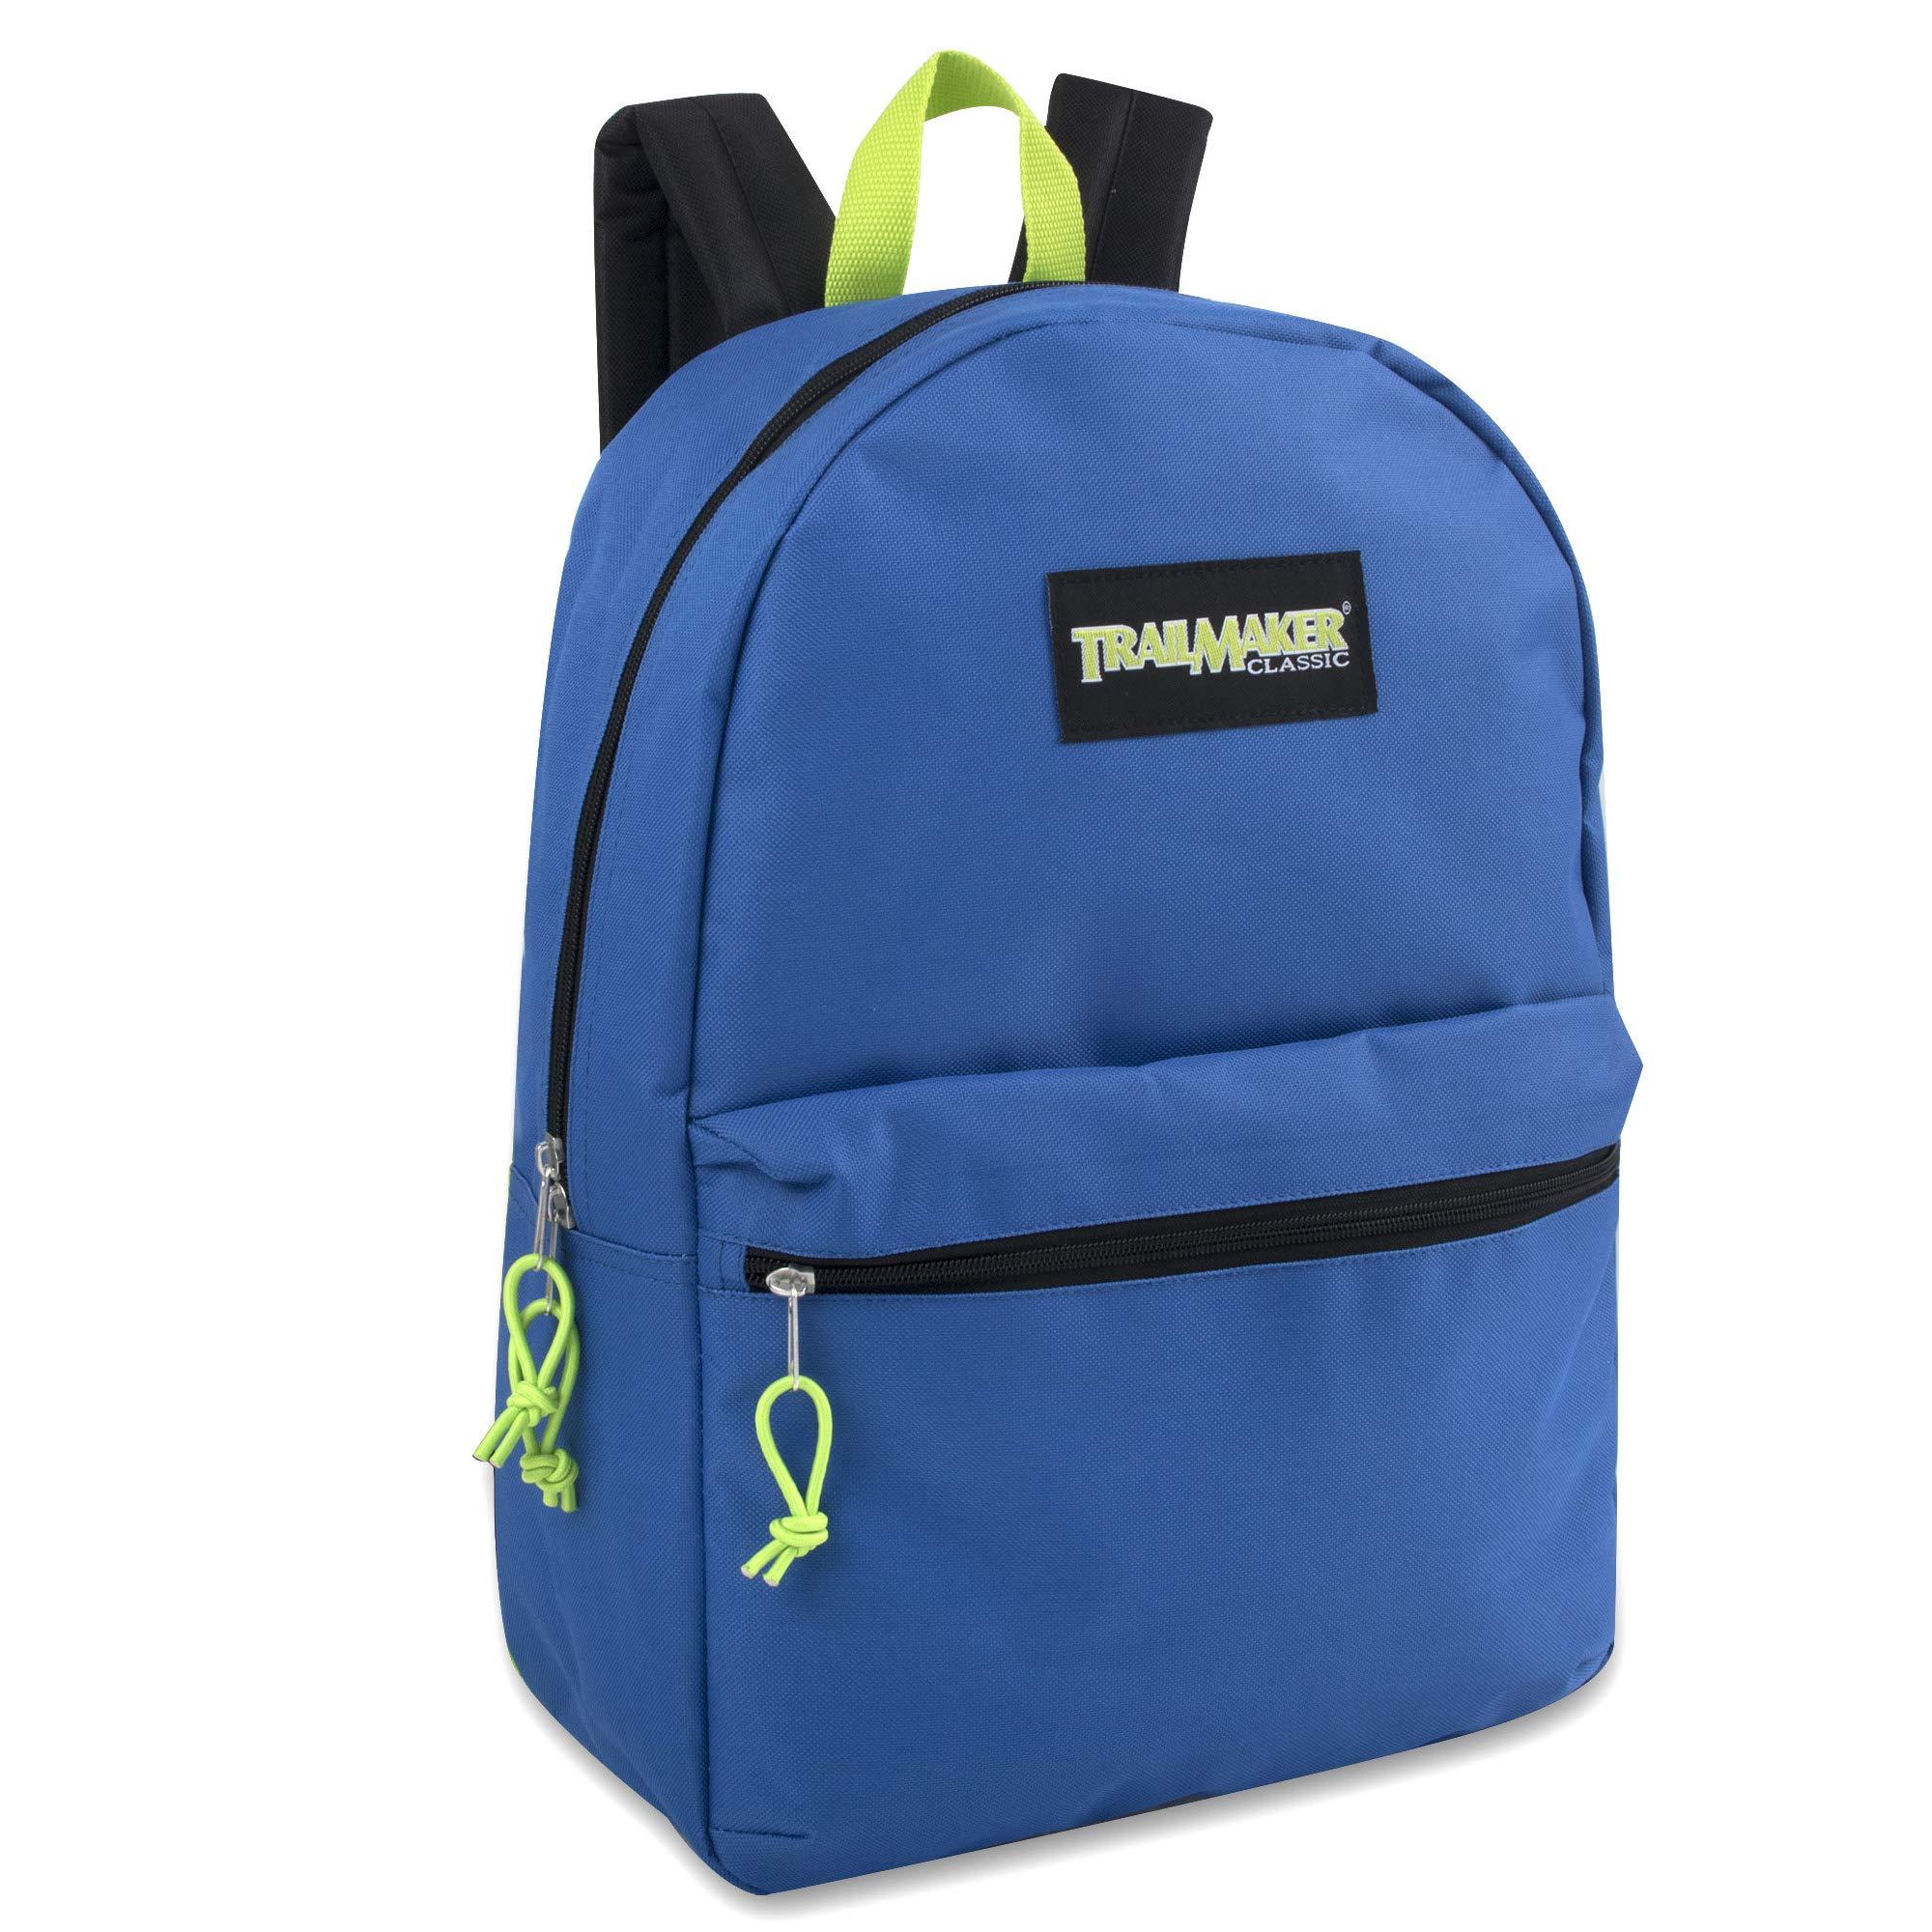 17'' Trailmaker Backpack Bookbag (Blue (01)) by Trail maker (Image #3)